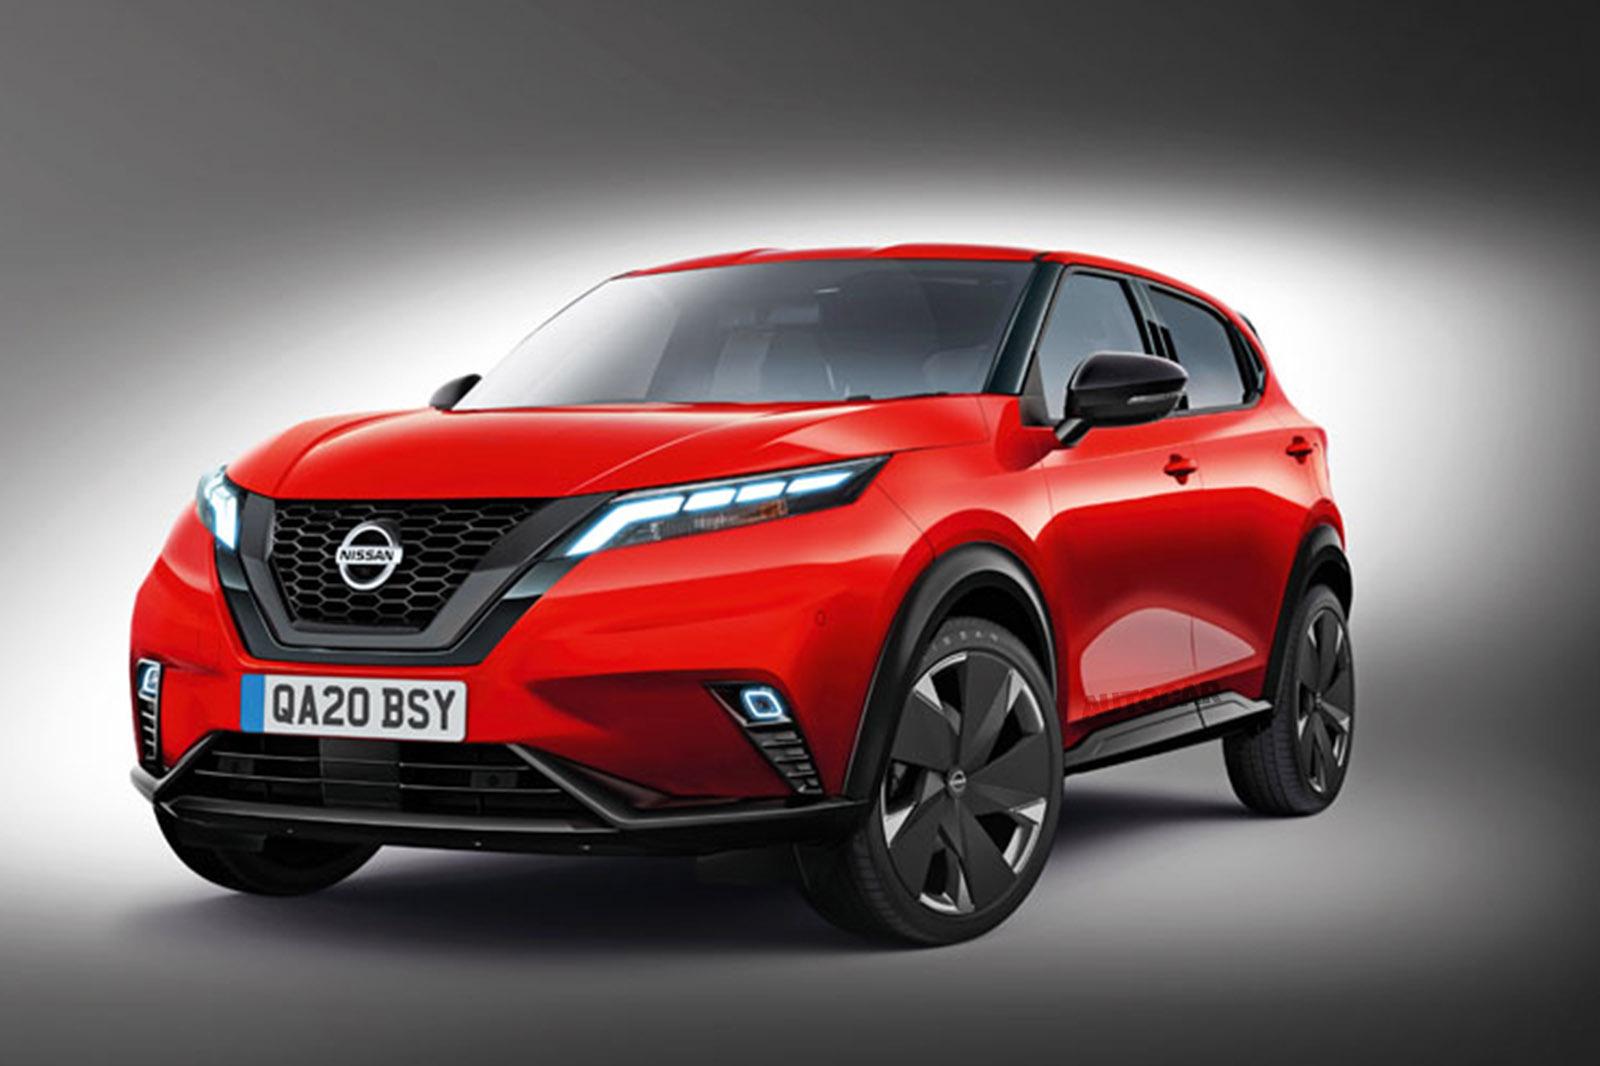 New 2020 Qashqai key to Nissan's three-pronged SUV assault ...